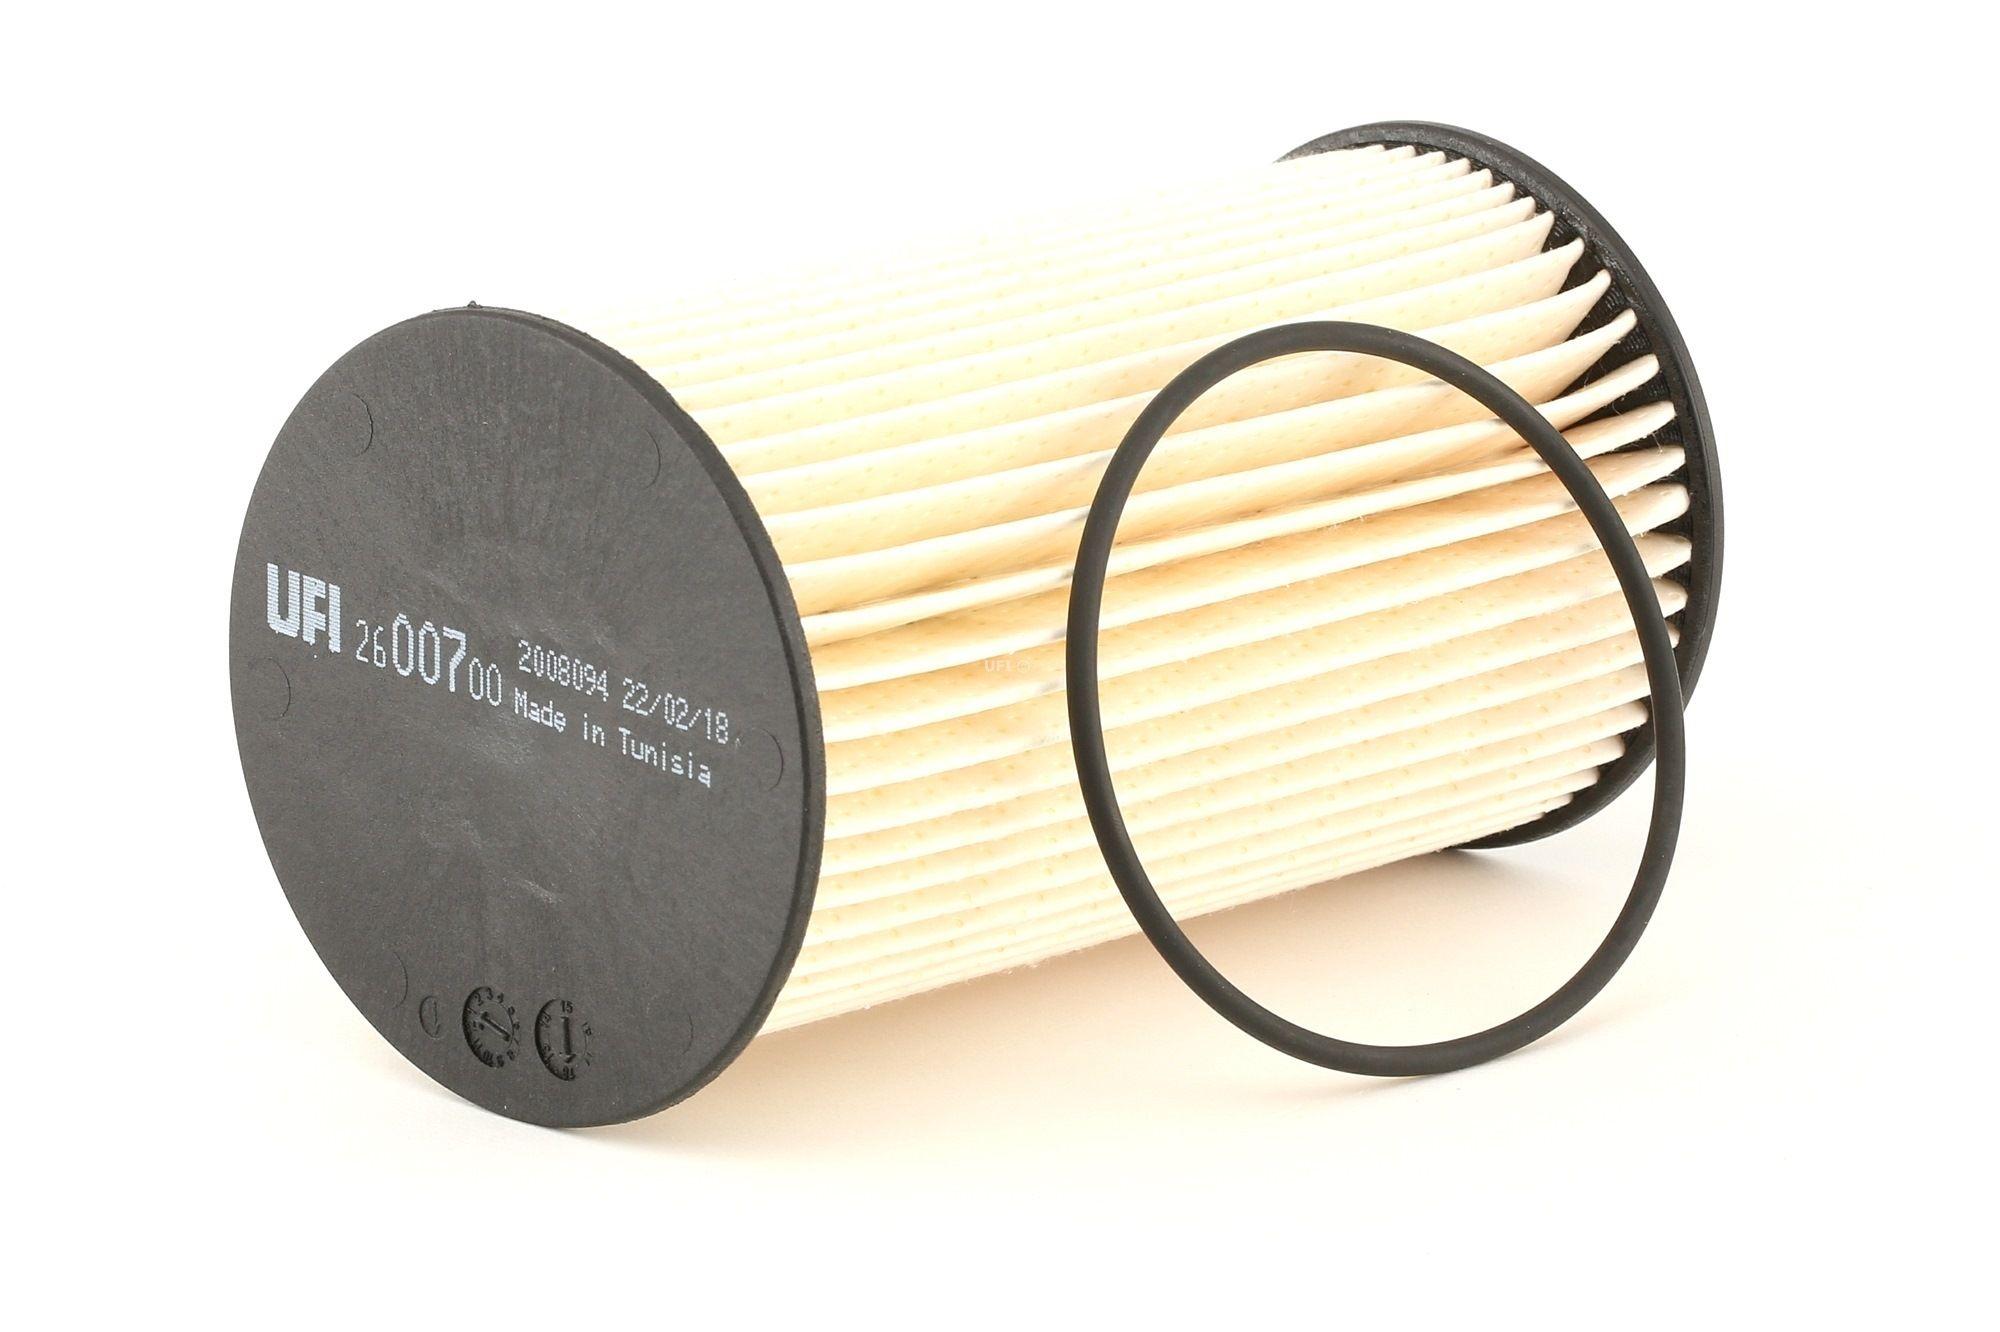 Fuel filter UFI 26.007.00 rating